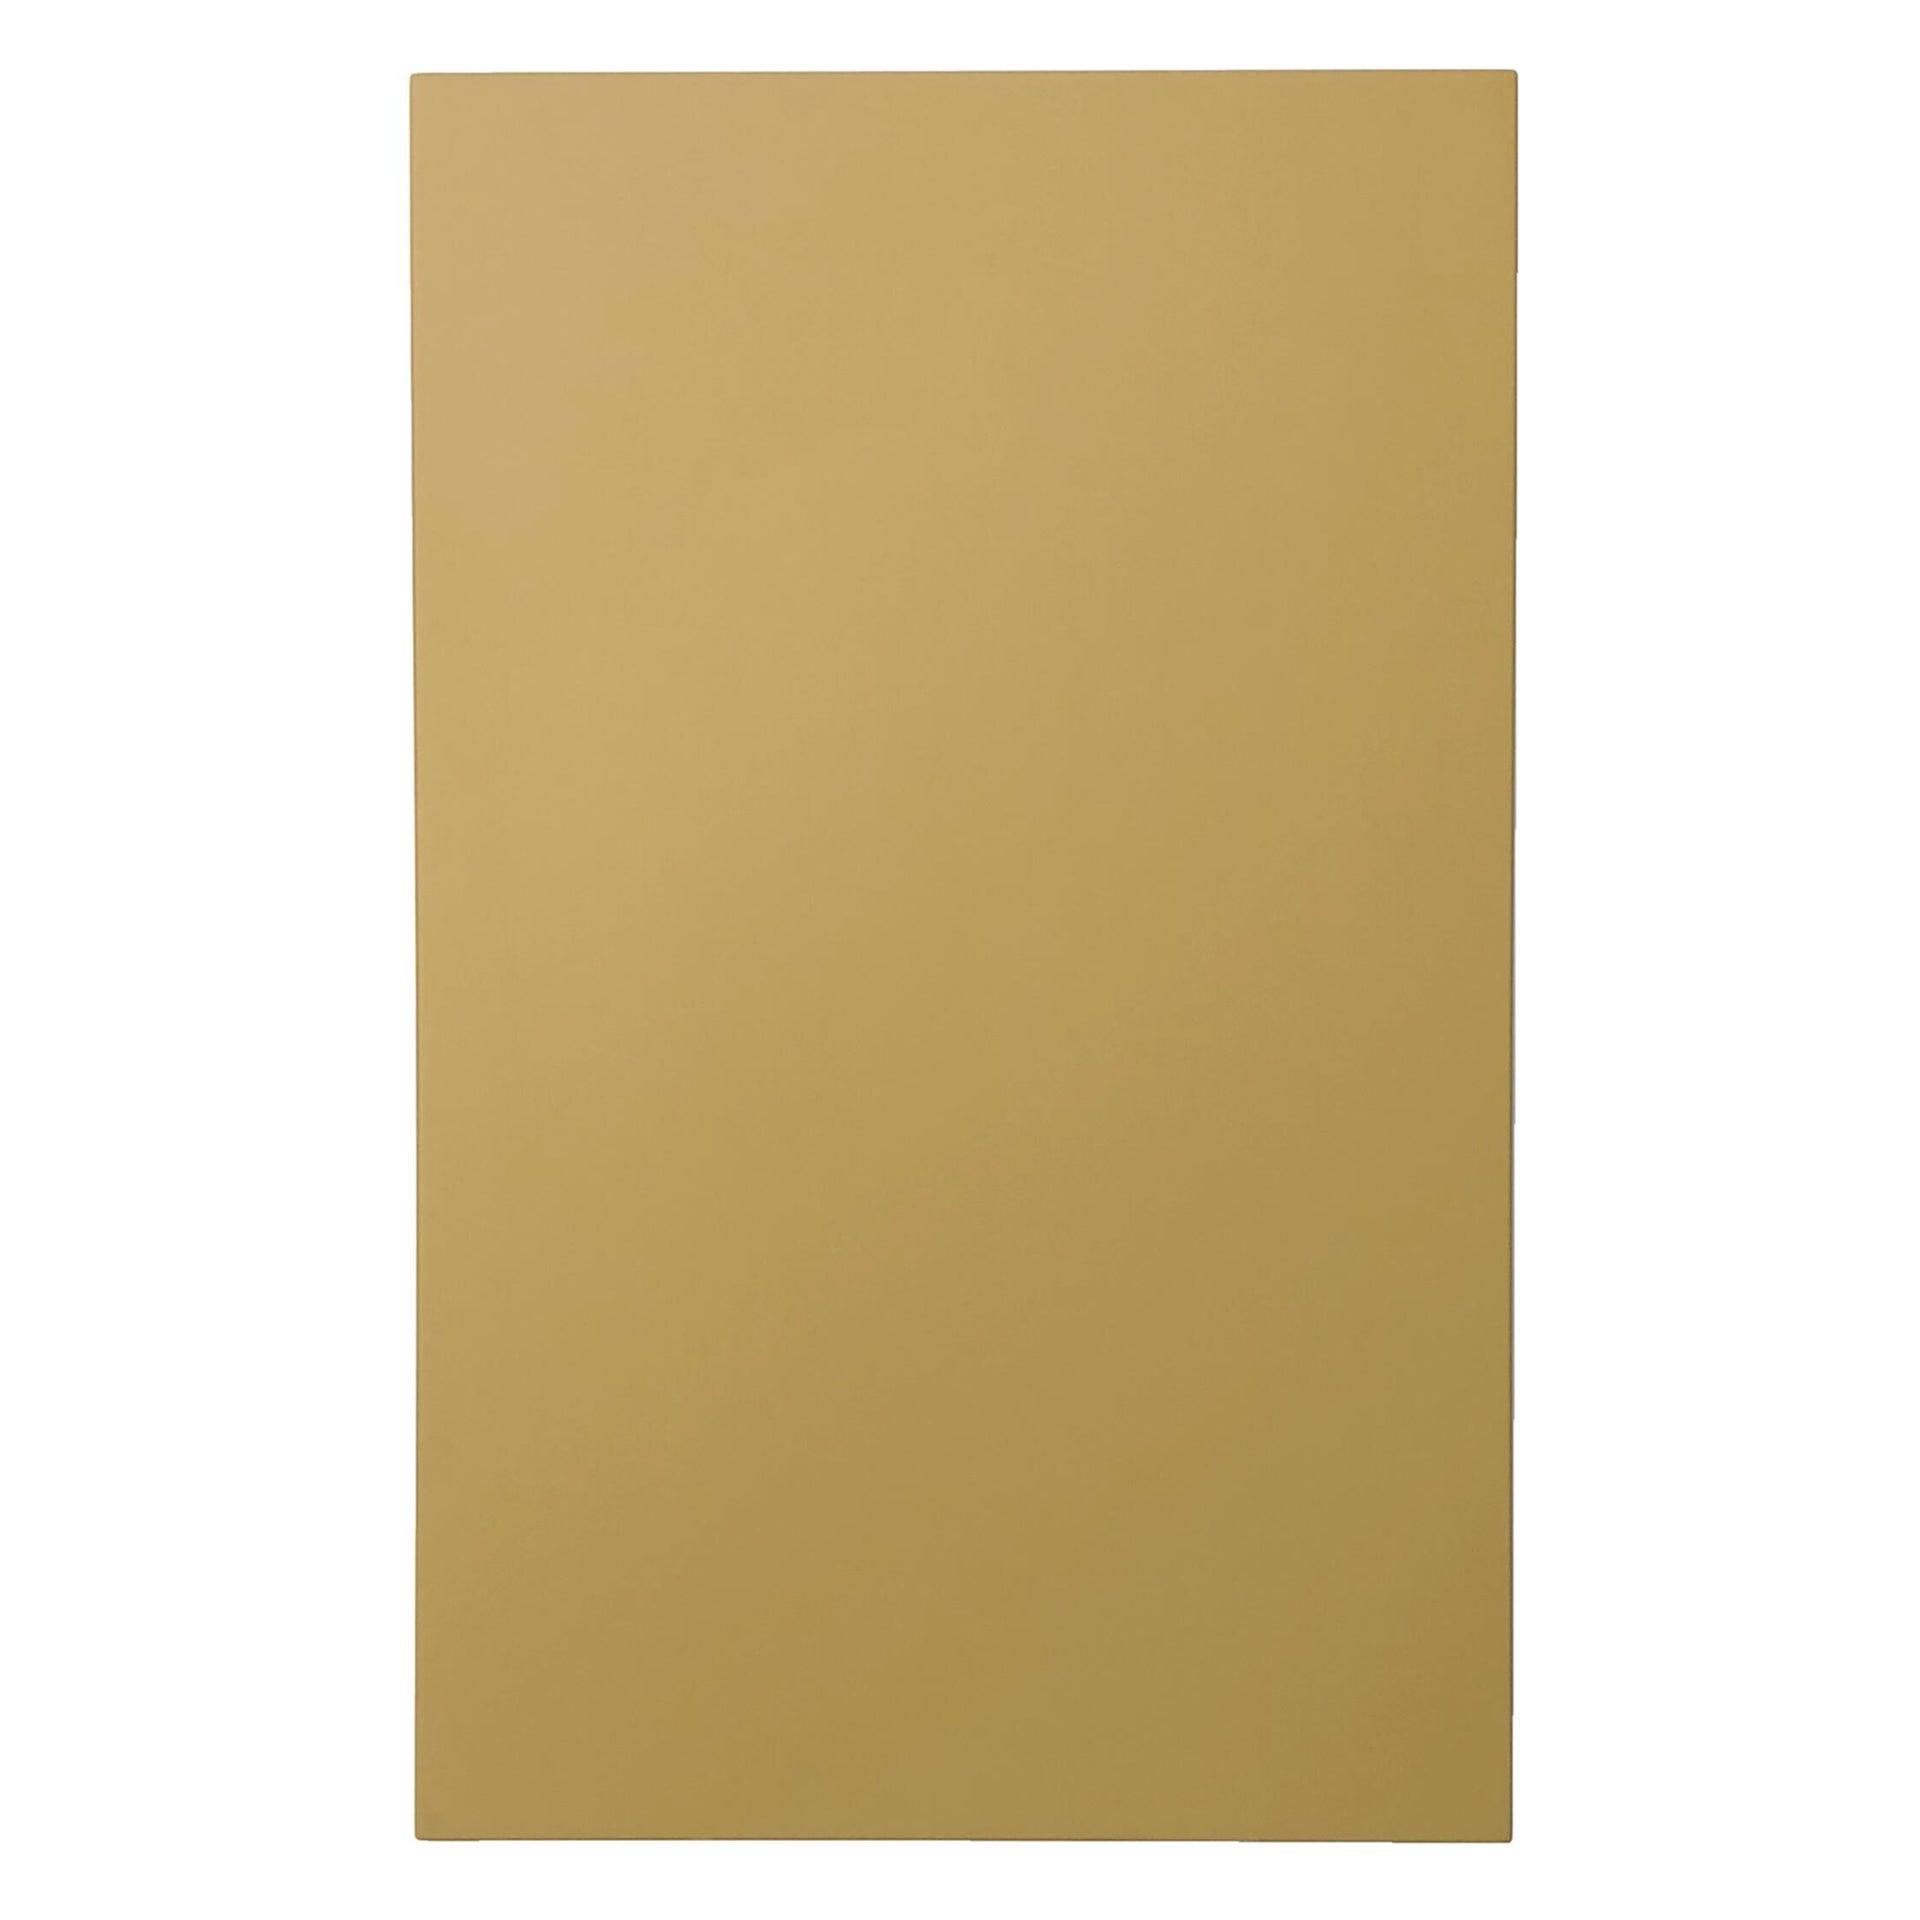 Anta DELINIA ID Parigi 76.5 x 59.7 giallo ocra